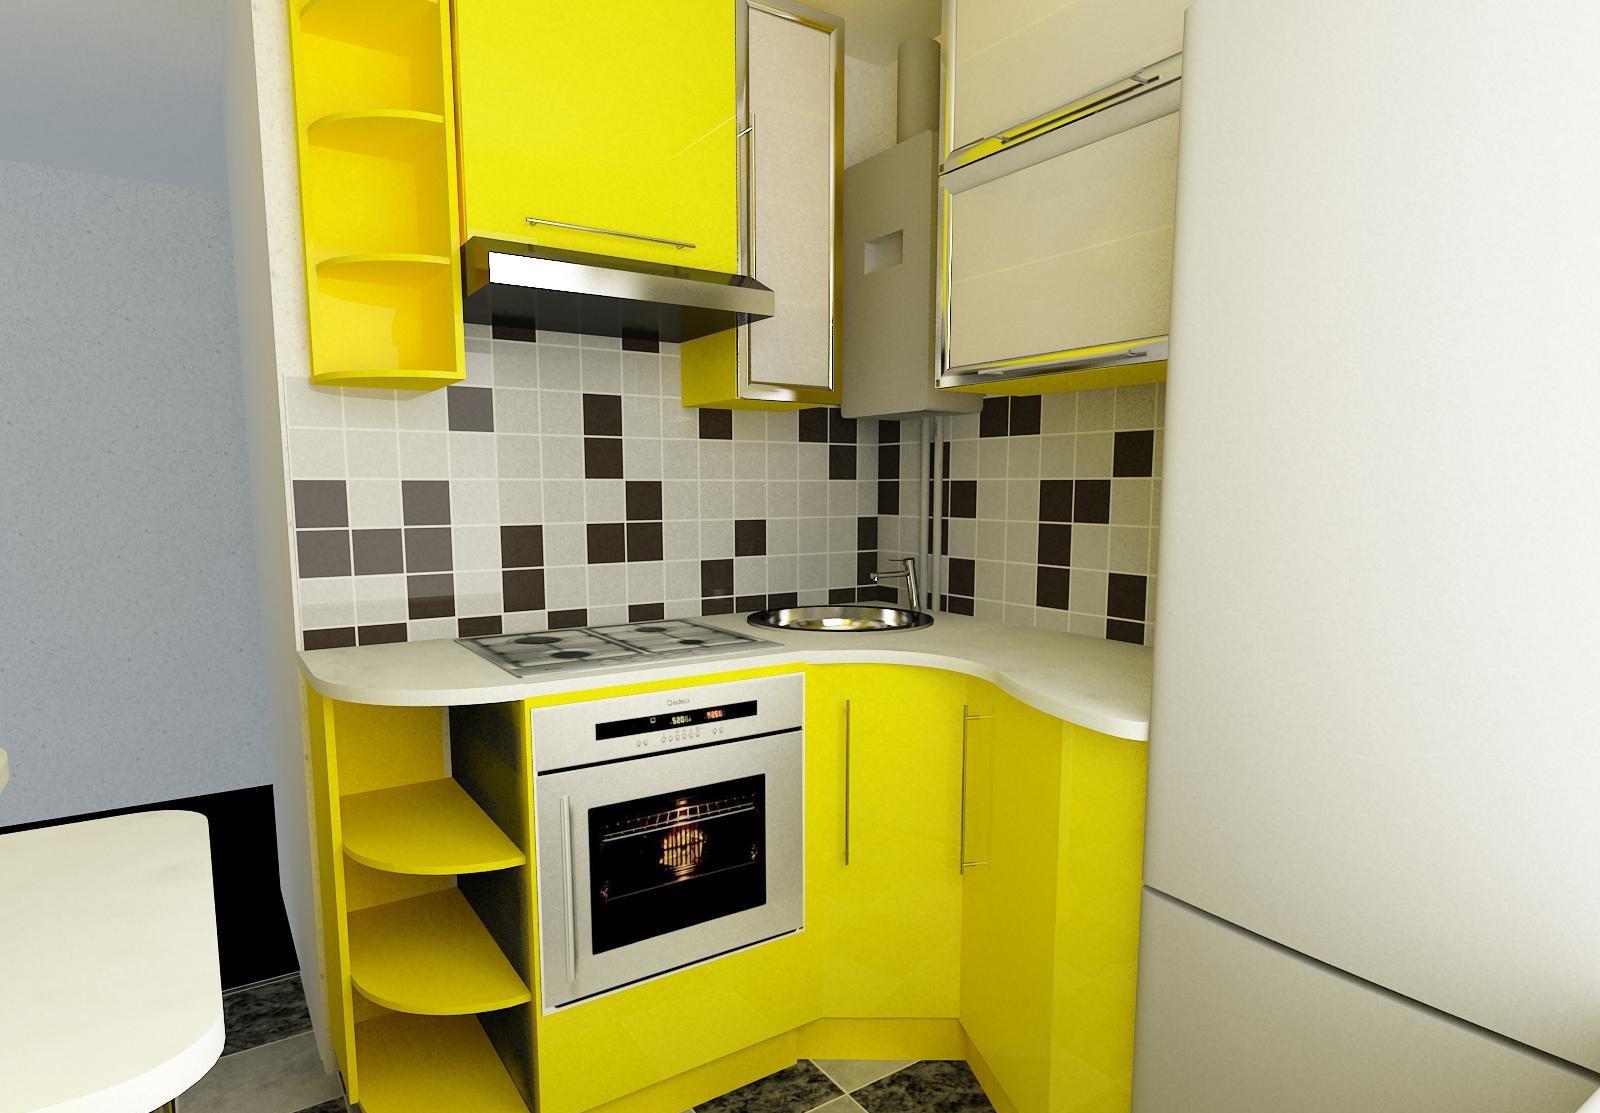 Желтая маленькая кухня 5 кв м